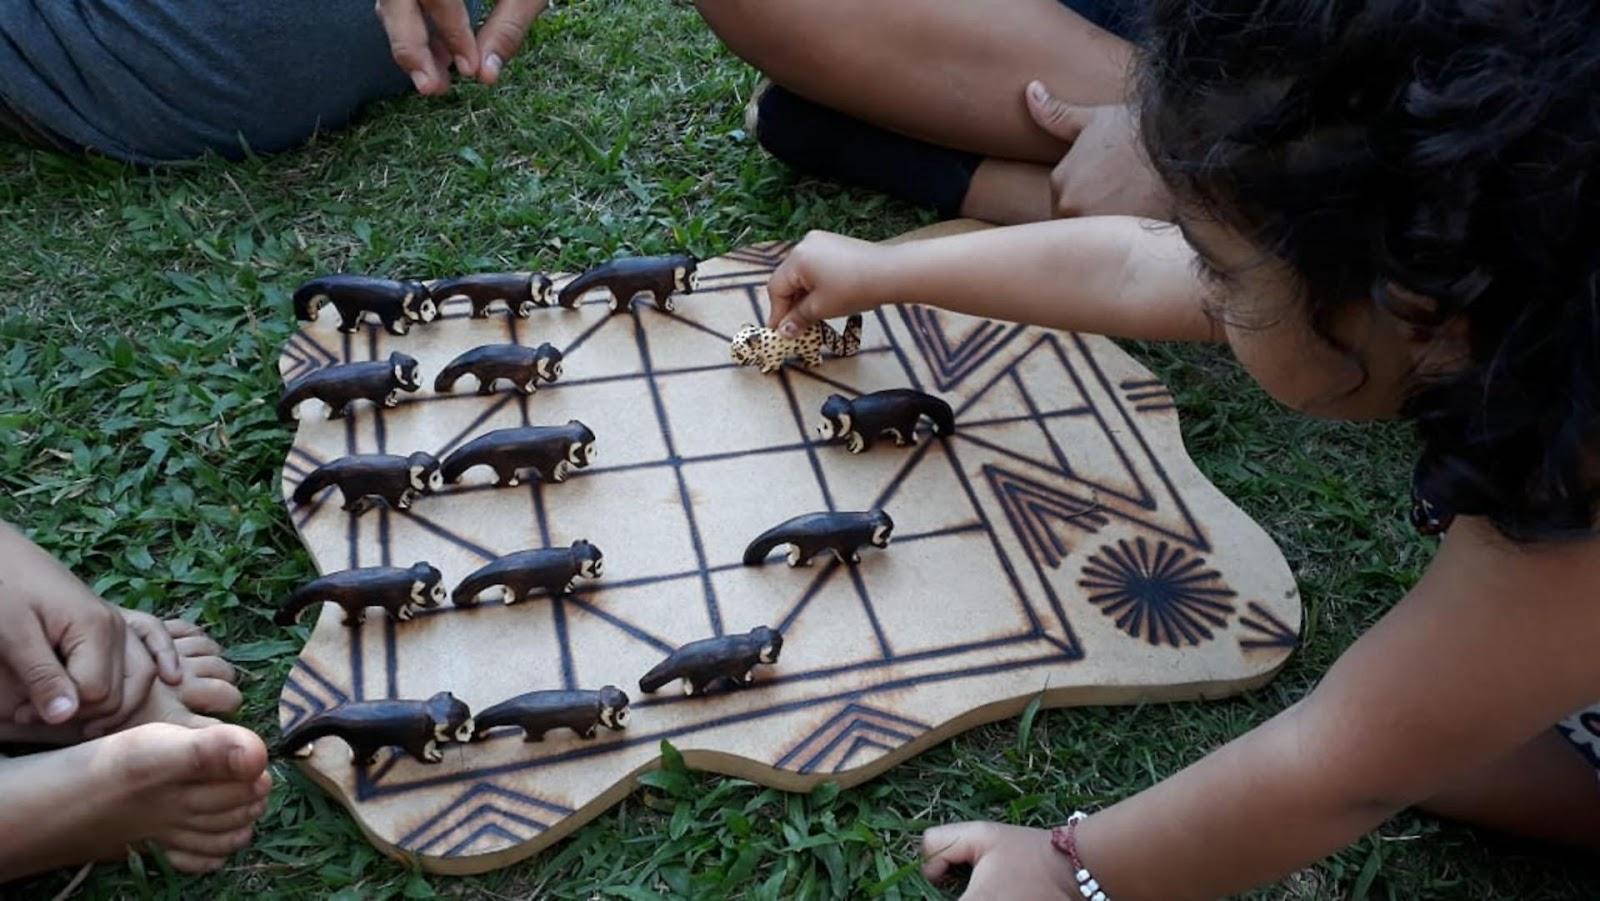 Educacao Fisica Jogos De Salao Jogos De Sorte E Estrategia Conexao Escola Sme